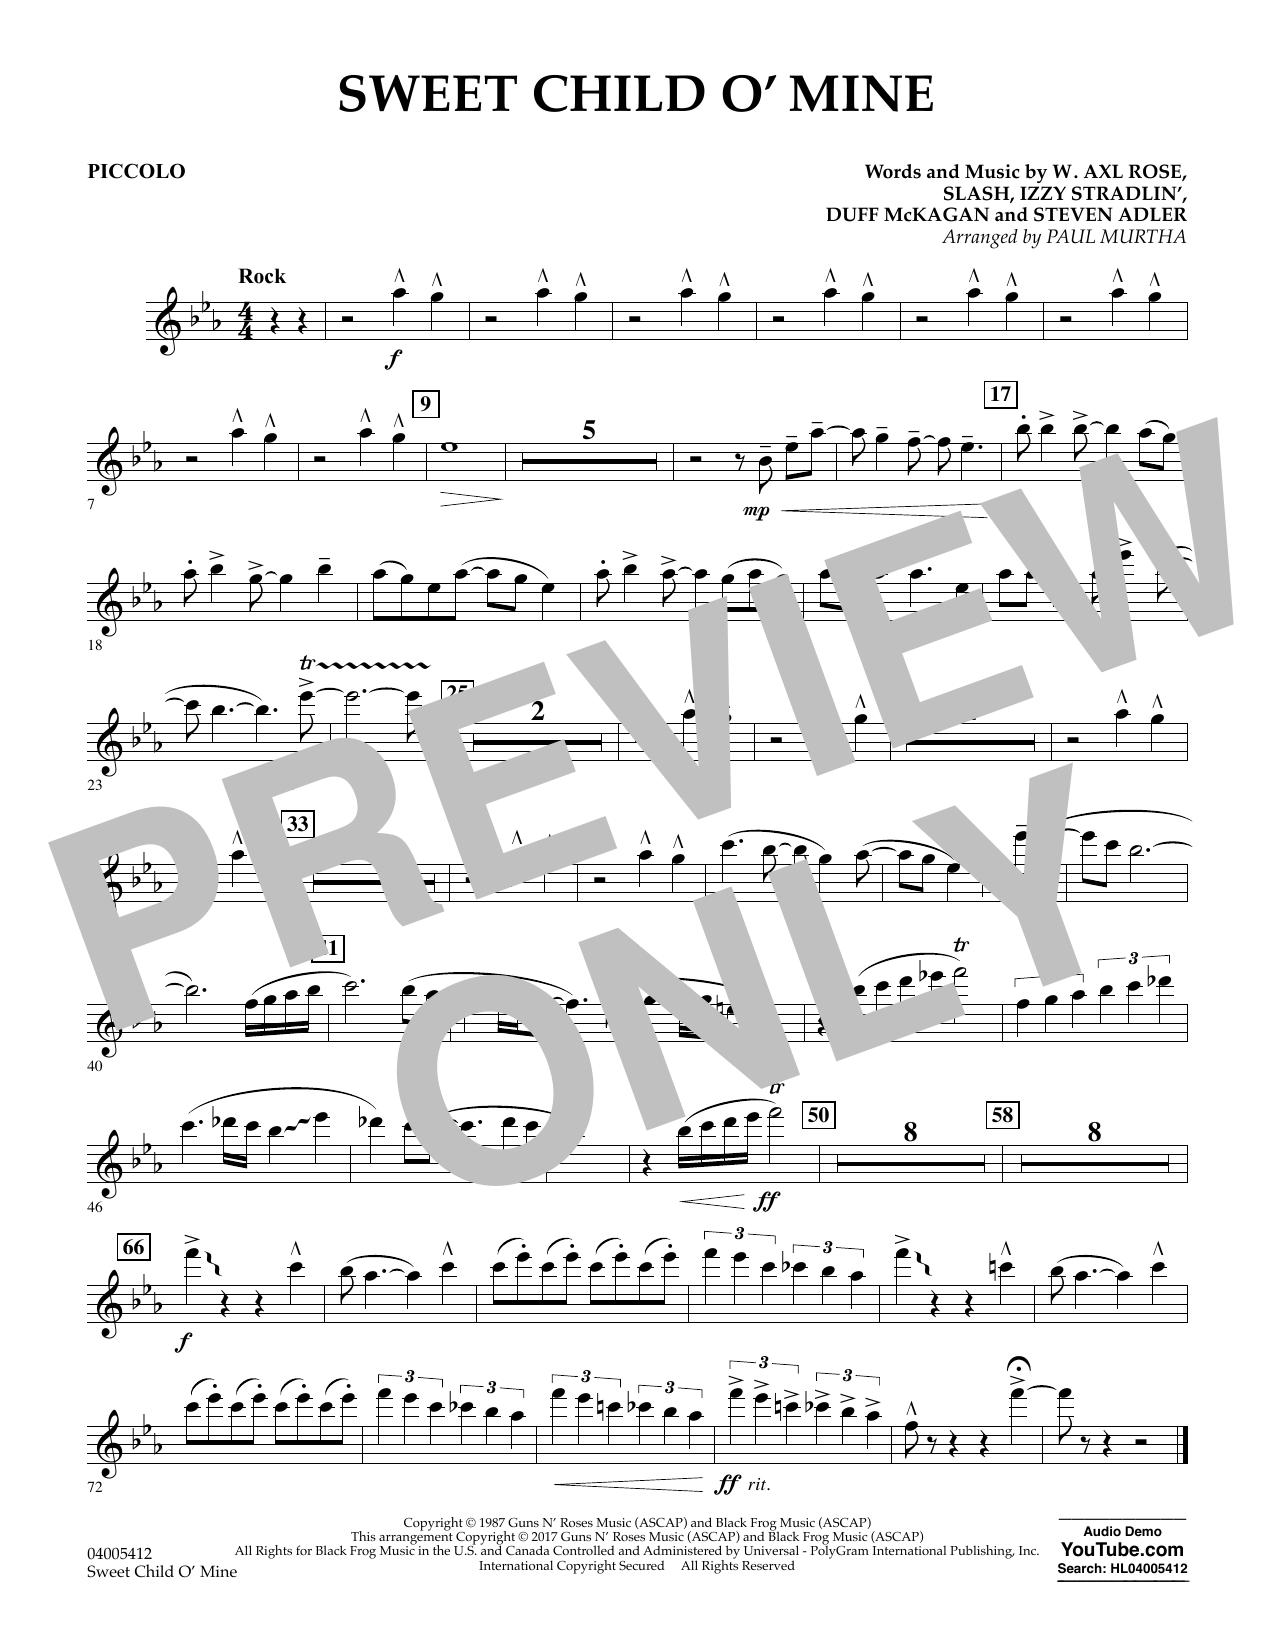 Sweet Child o' Mine - Piccolo (Concert Band)